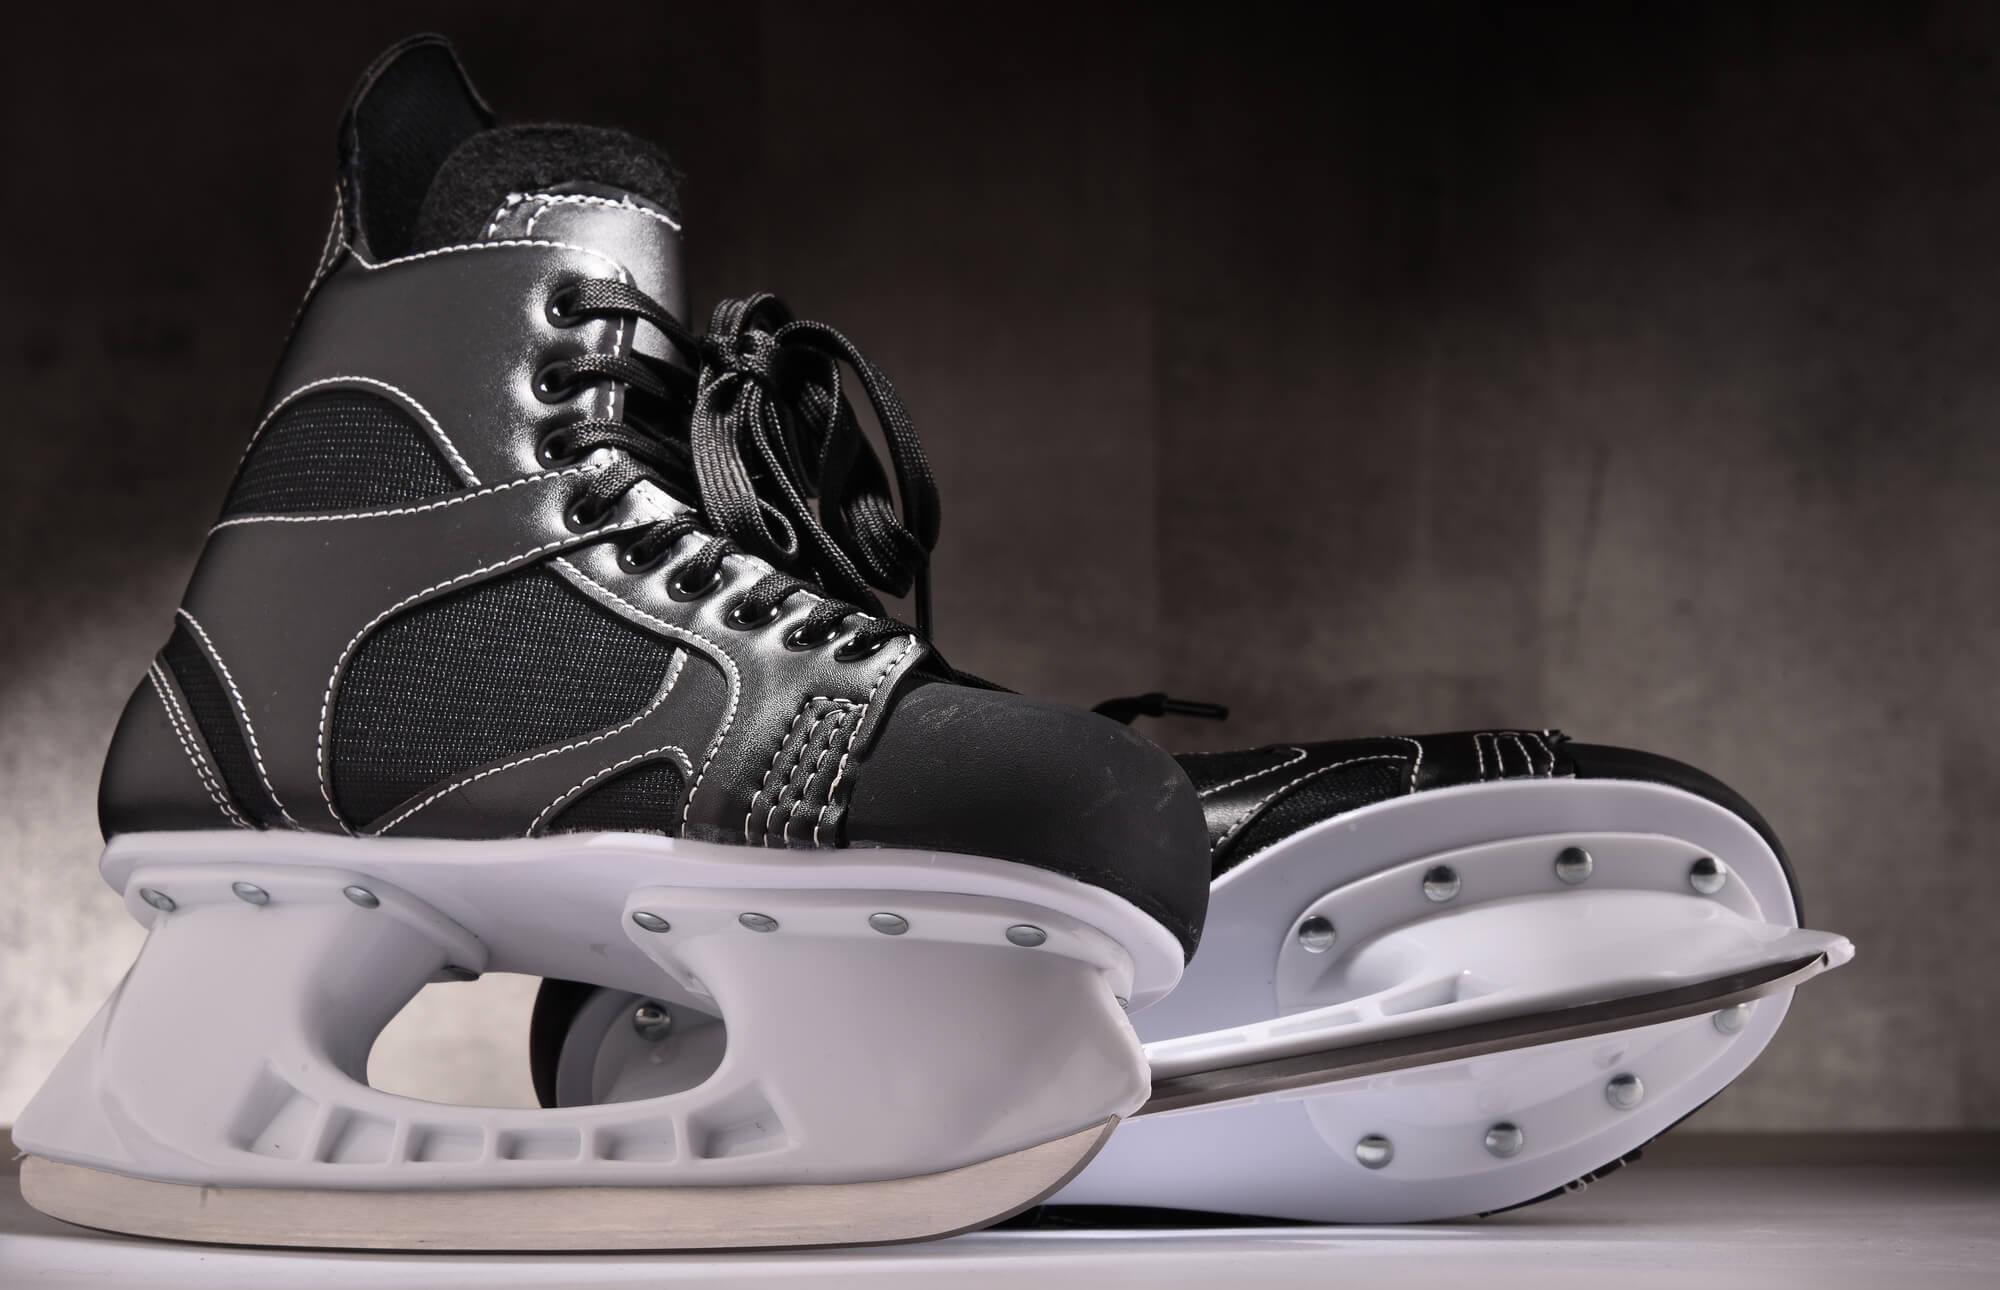 hockey skates hurt my feet